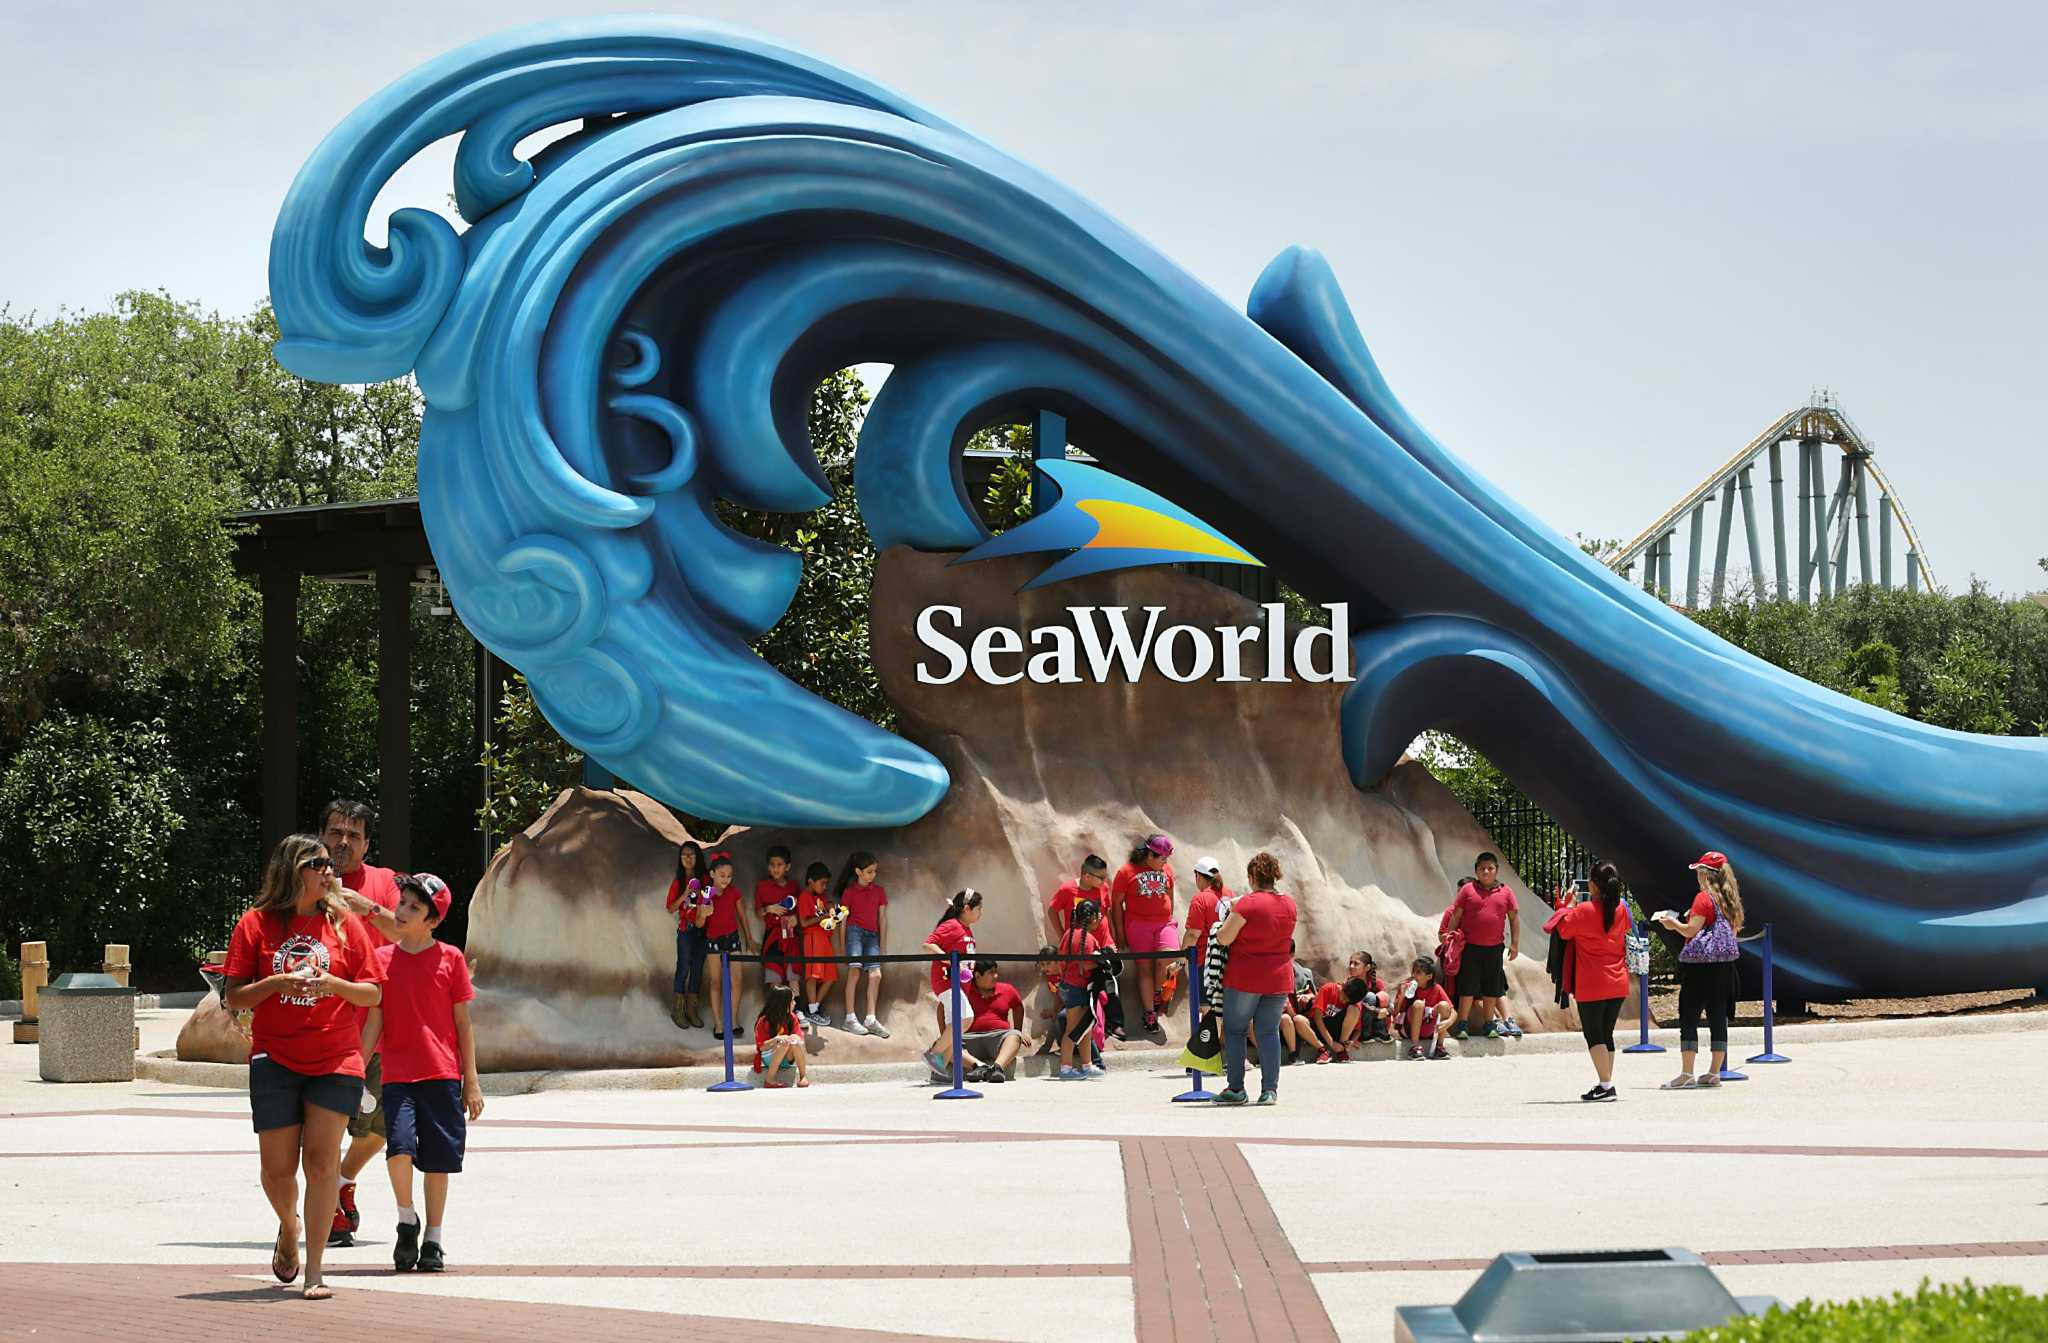 SeaWorld San Antonio addresses report saying park trains marine mammals for 'circus-like' shows